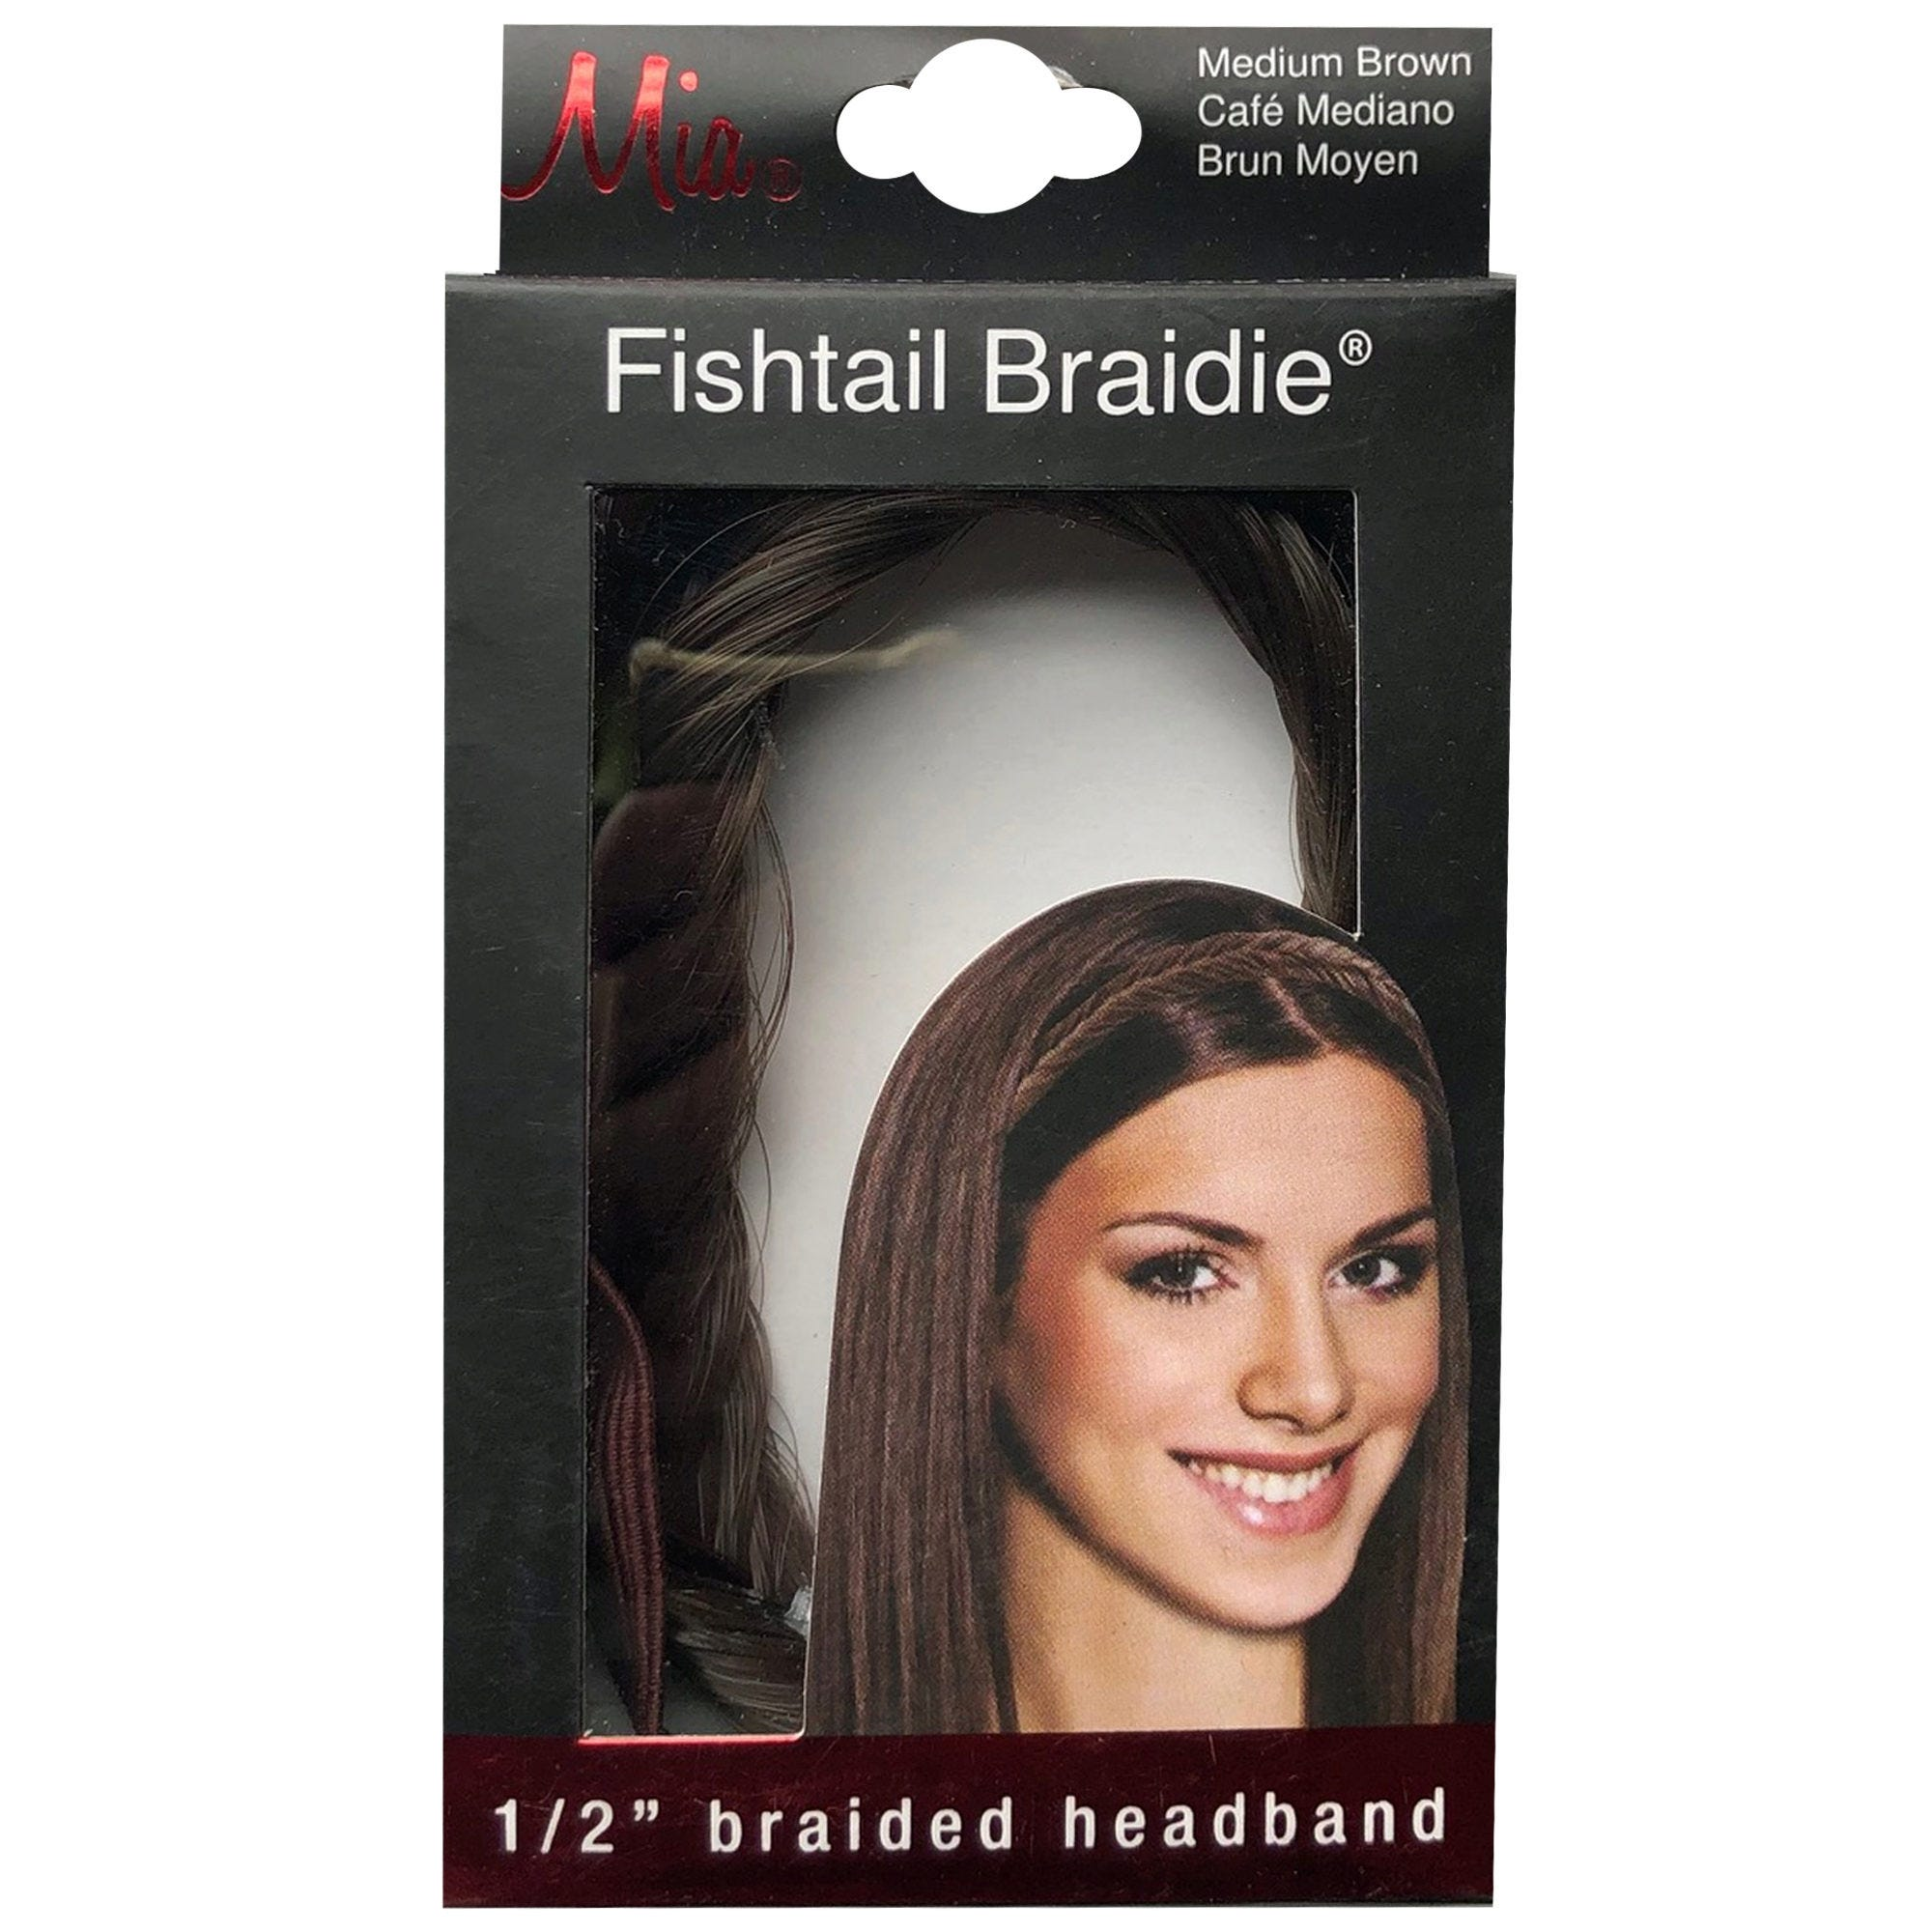 ''Mia Beauty 1/2'''' Medium Brown Fishtail Braided HEADBAND- Qty 24''